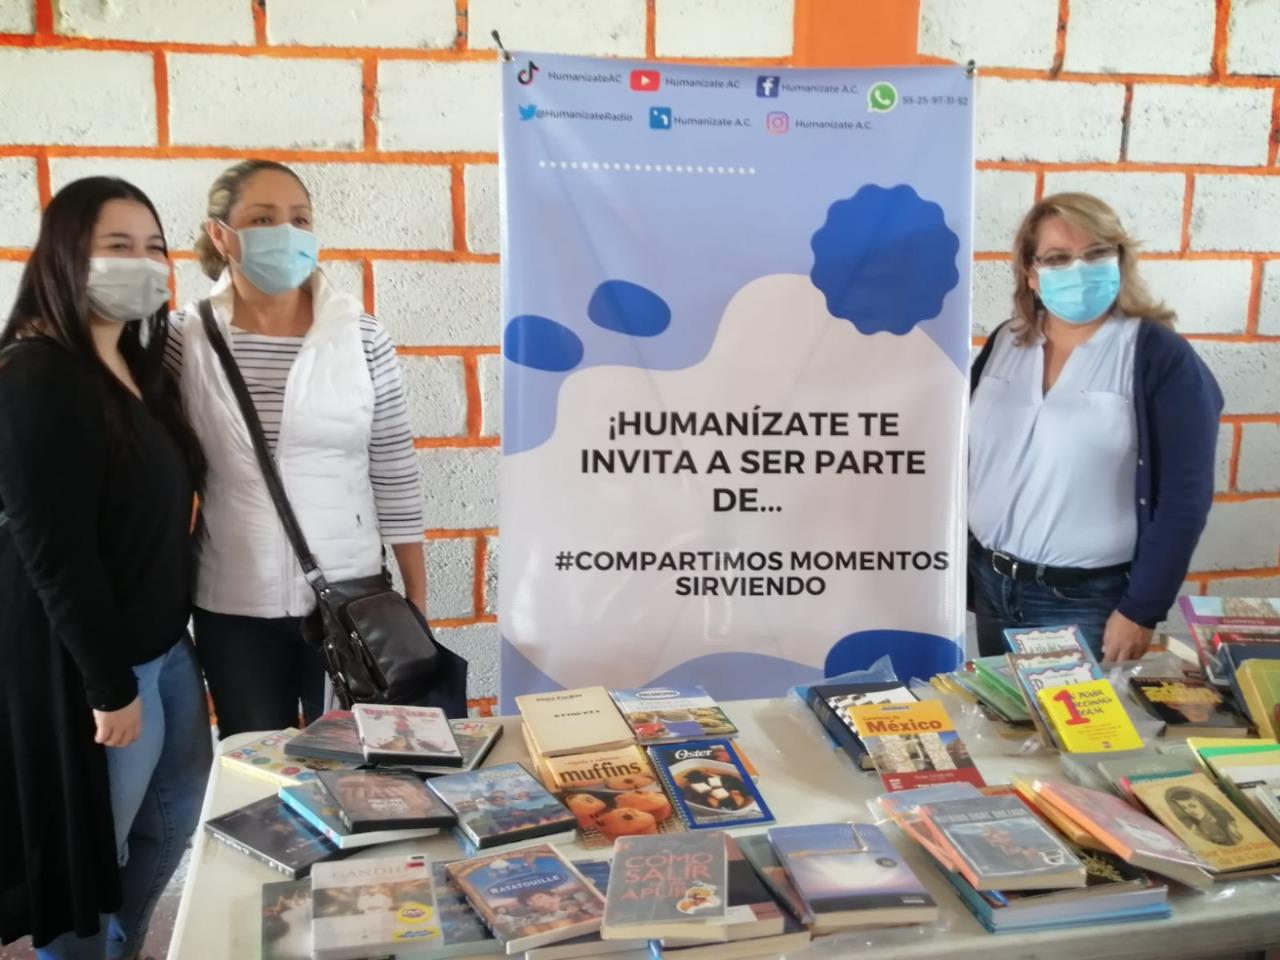 JAPEM ENTREGA DONATIVOS A INSTITUCIONES DE ASISTENCIA PRIVADA